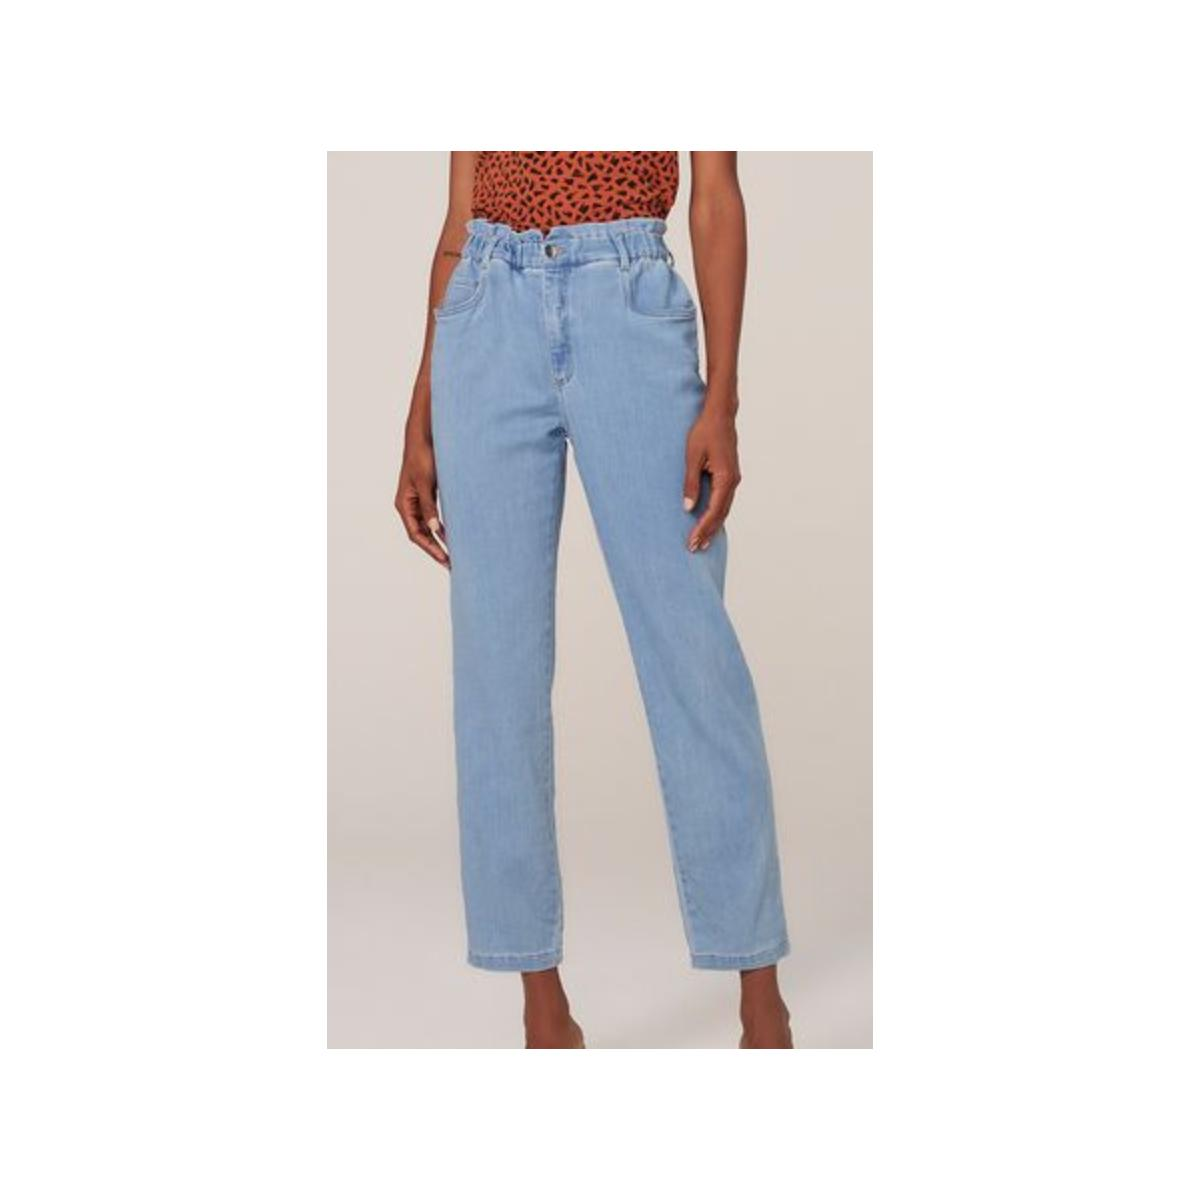 Calça Feminina Dzarm Zu4r 1bsn Jeans Claro